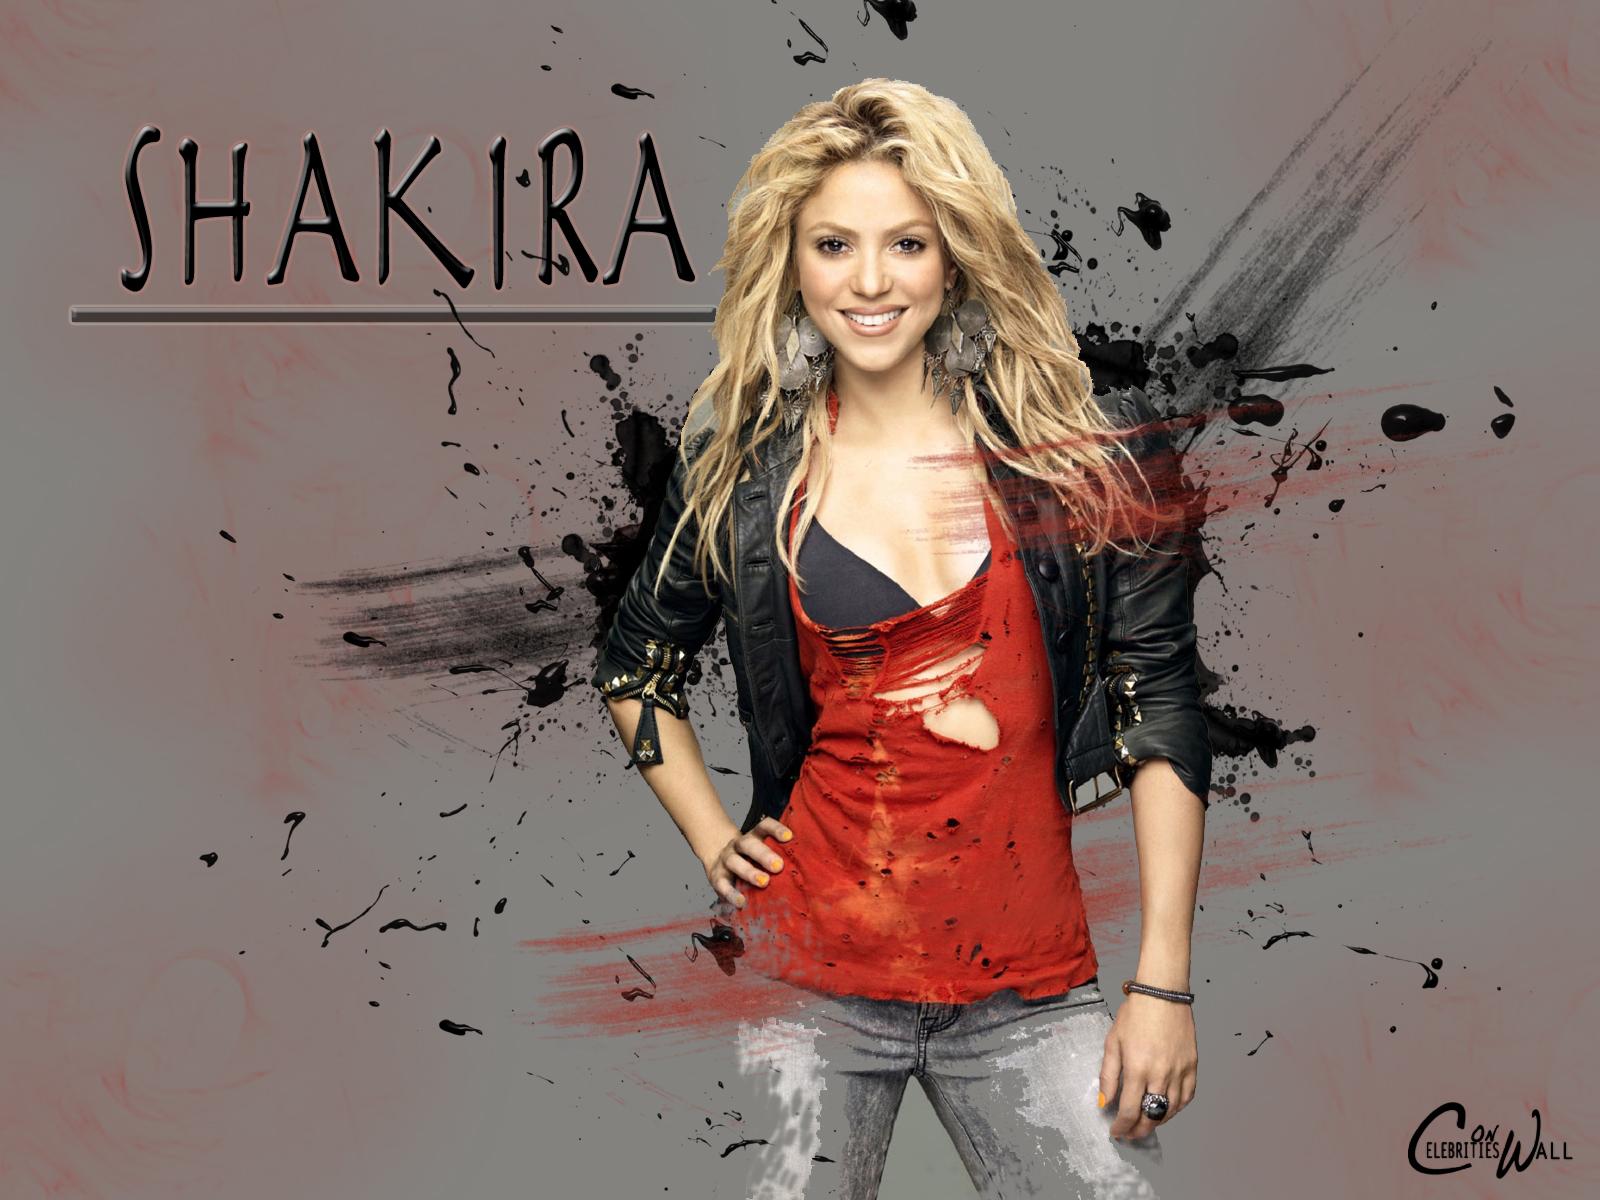 73] Shakira Wallpapers on WallpaperSafari 1600x1200